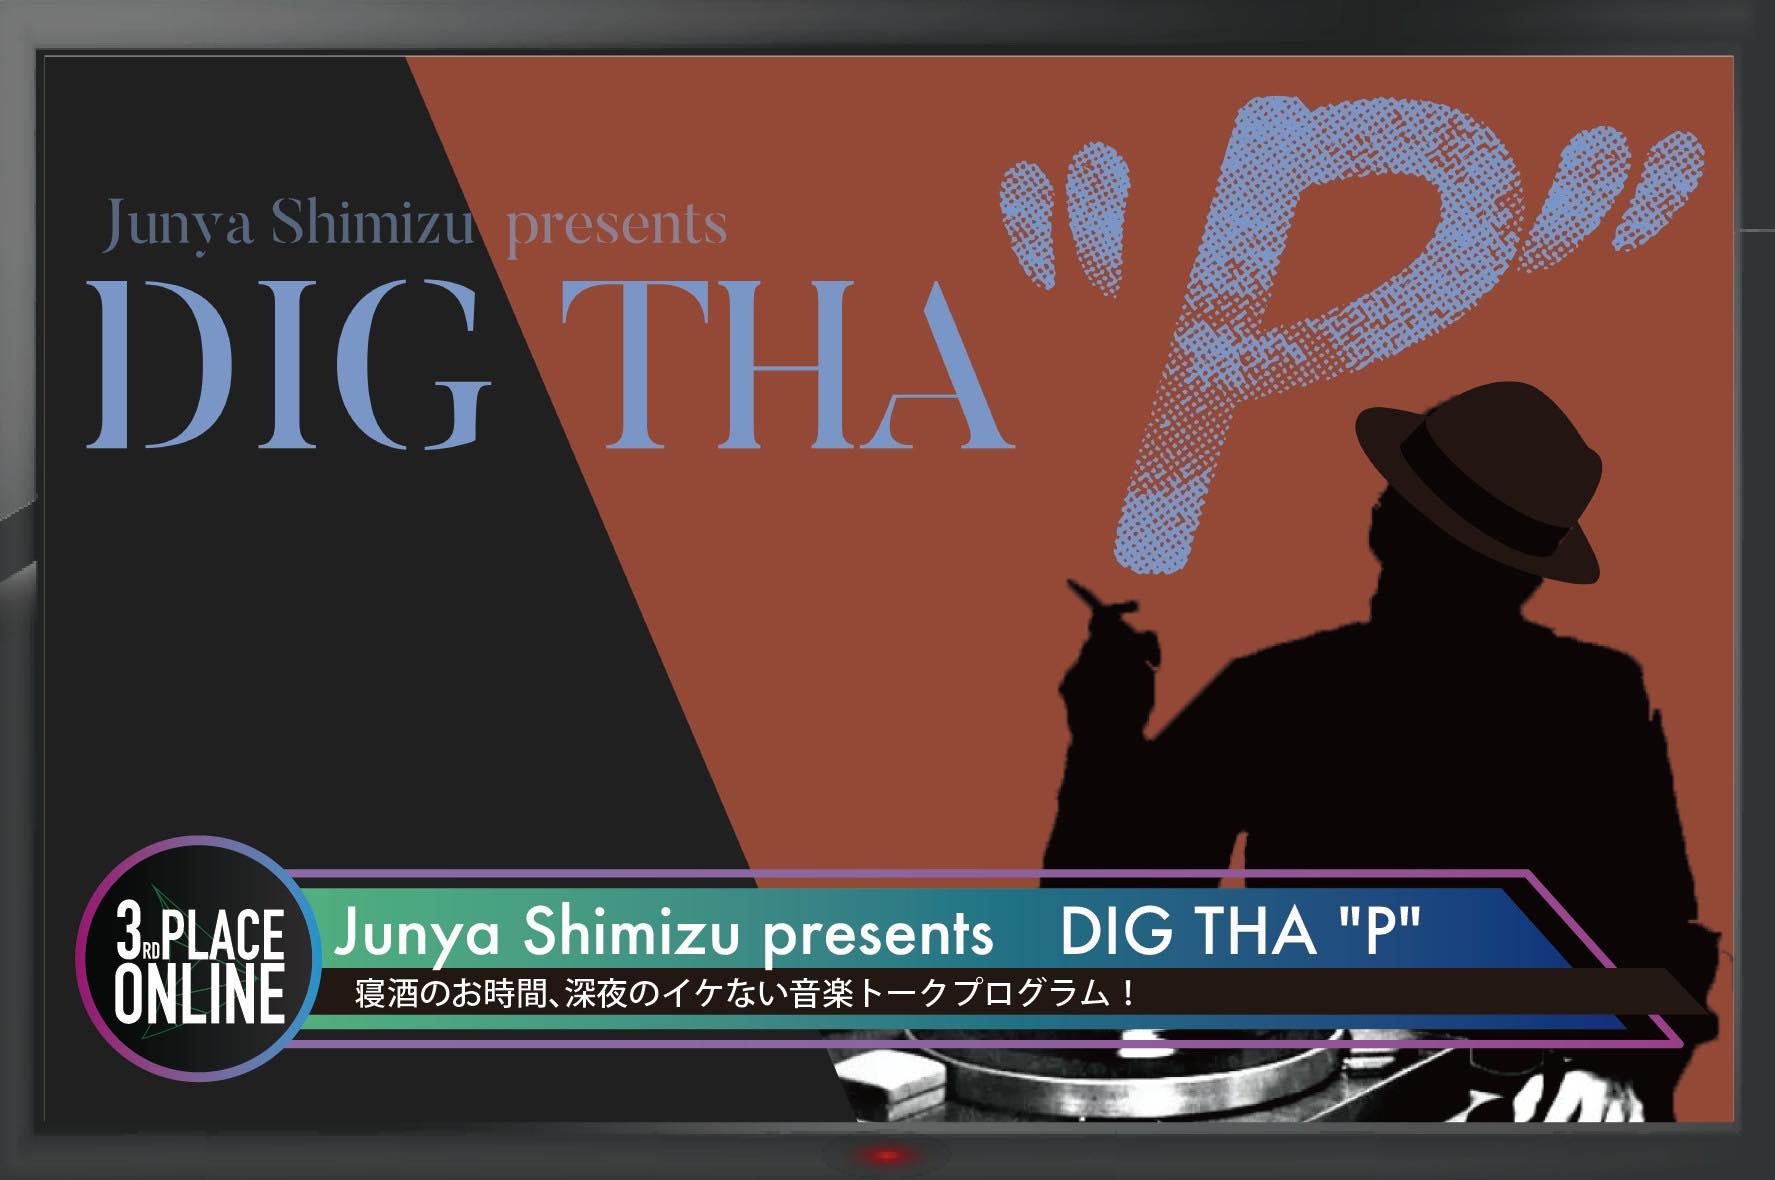 "Junya Shimizu presents DIG THA ""P"""